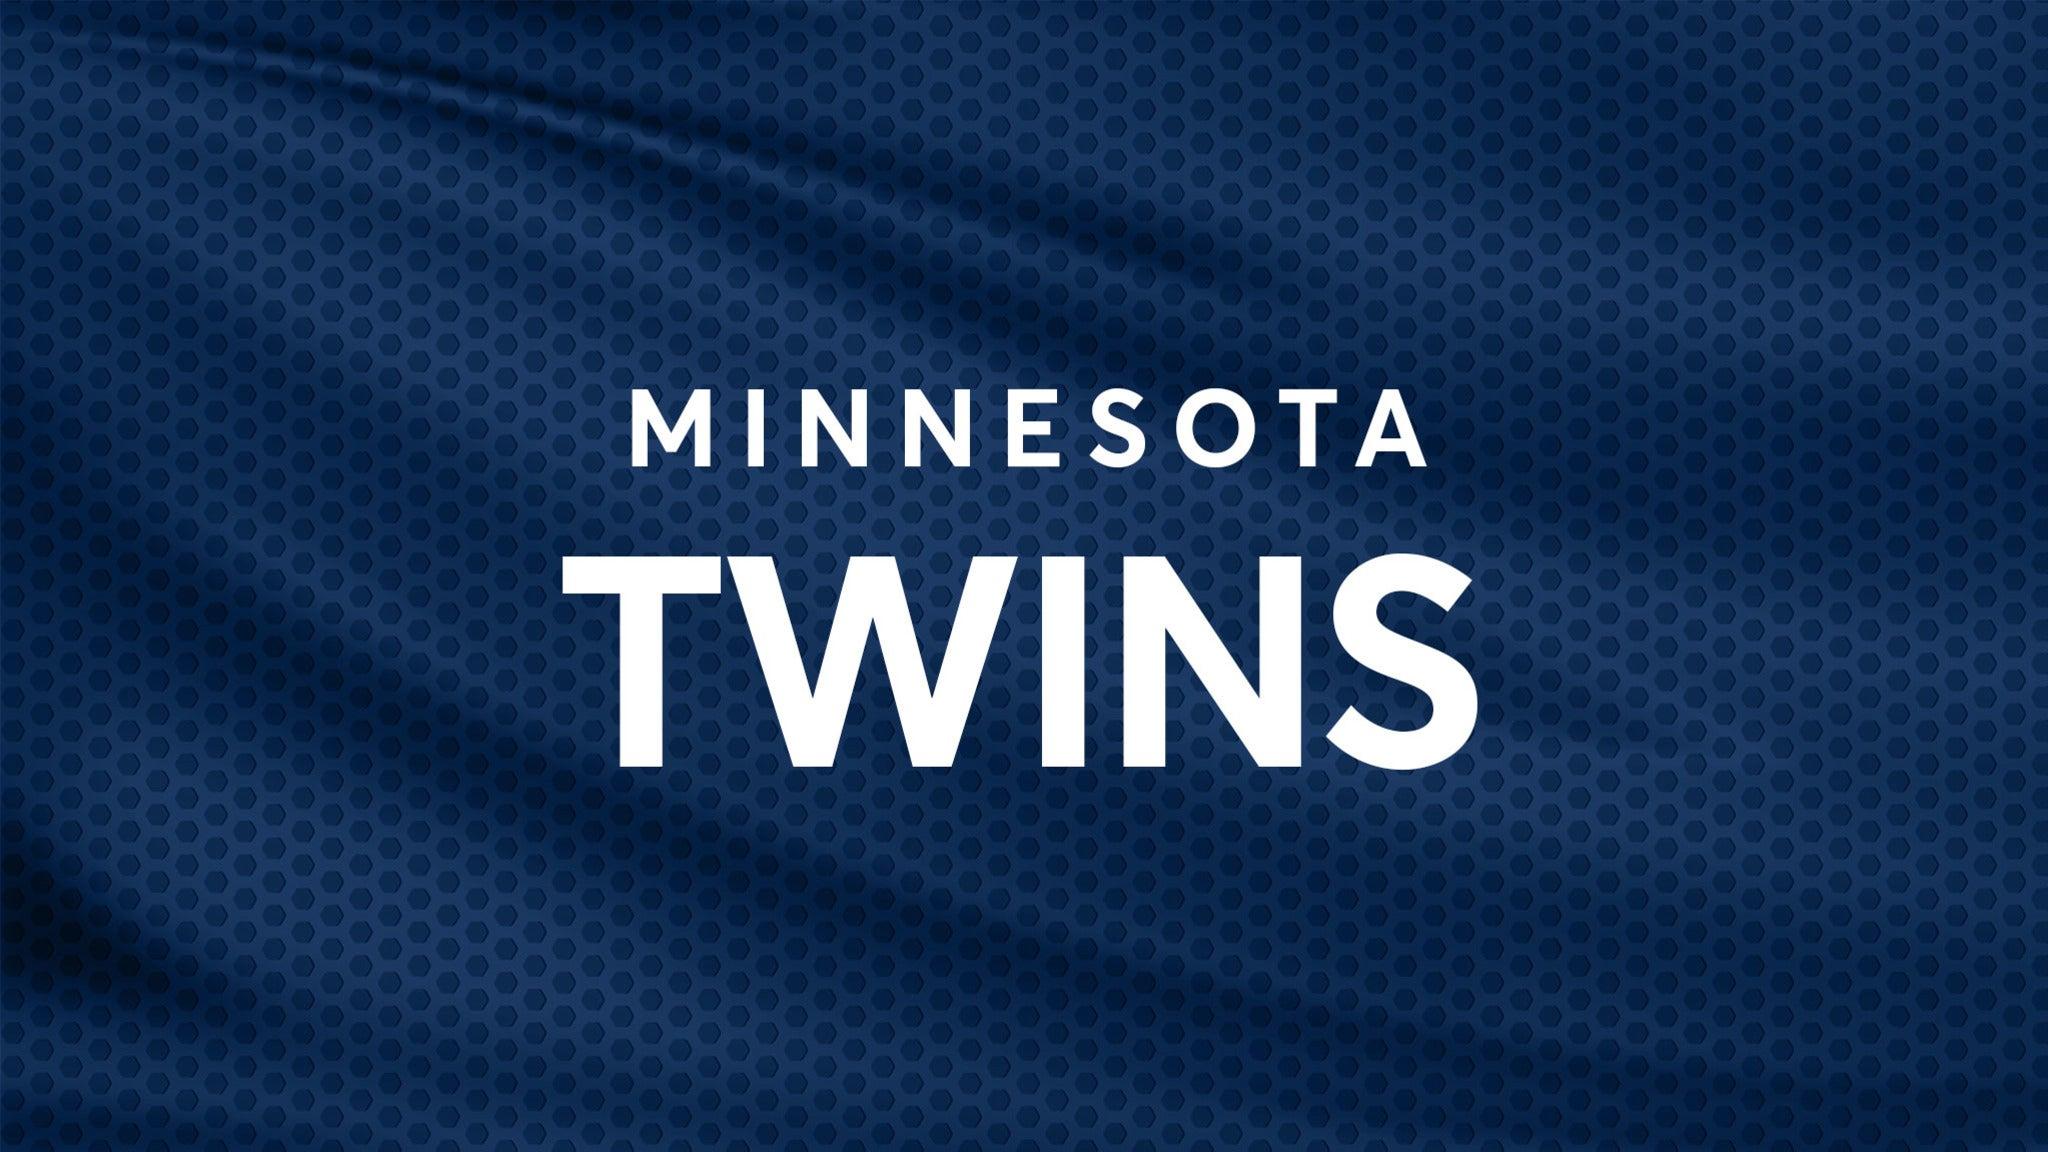 Minnesota Twins vs. Oakland Athletics